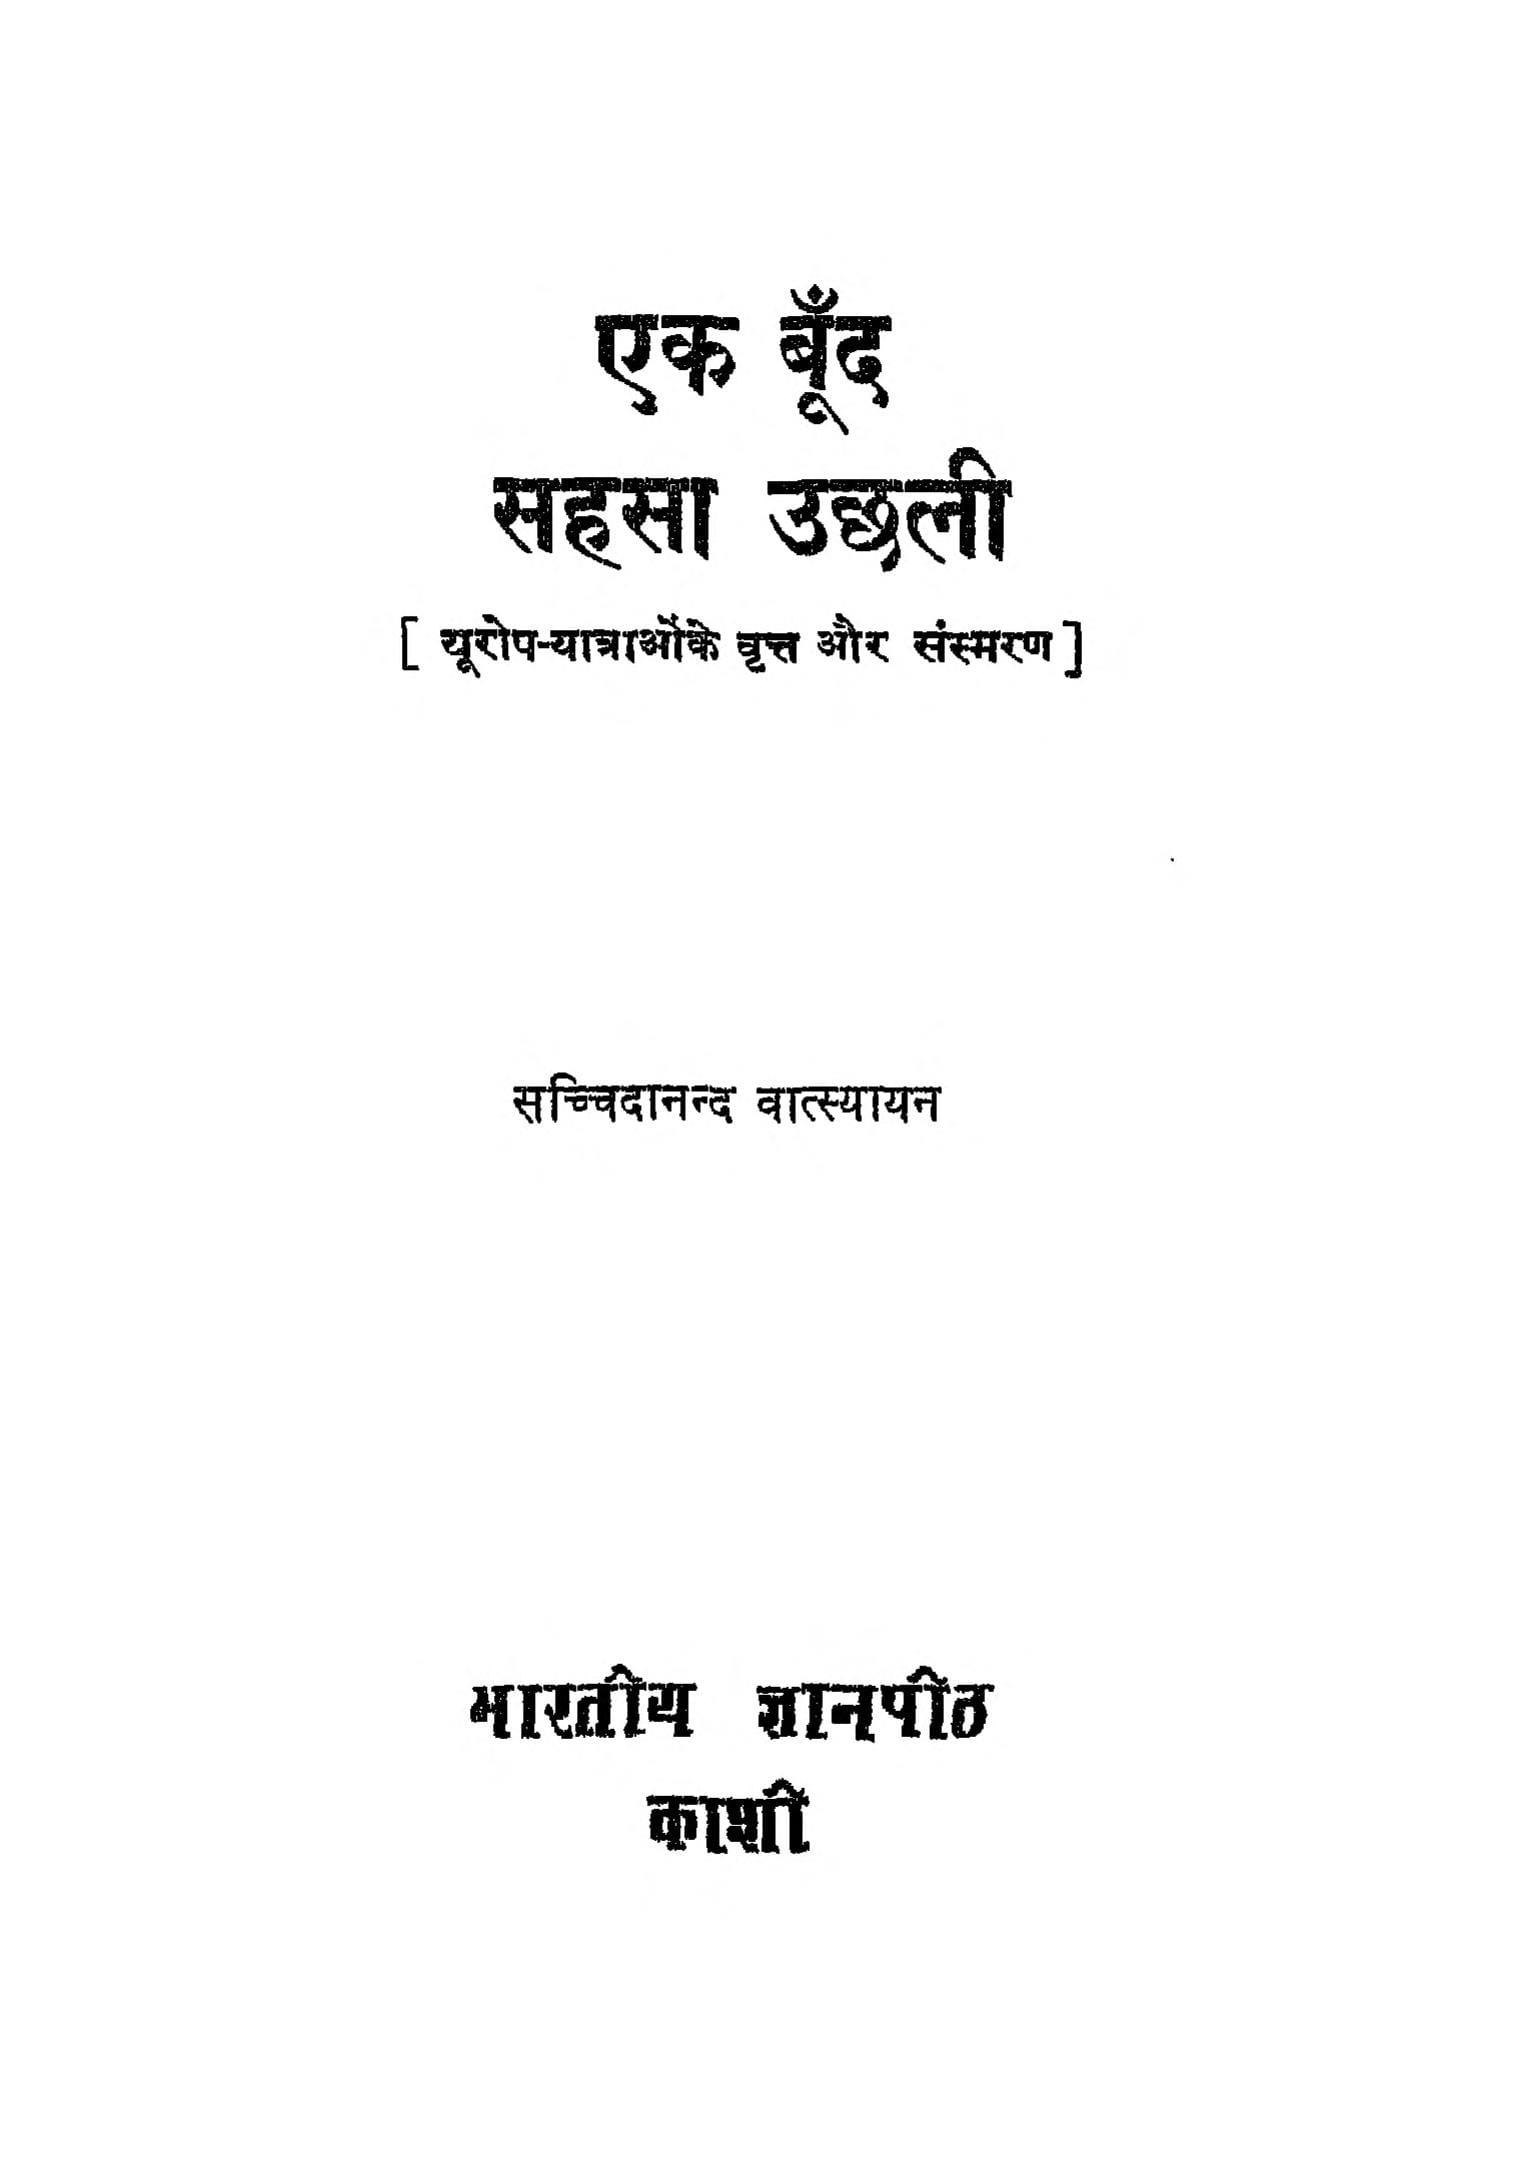 Book Image : एक बूँद सहसा उछली - Ek Boond Sahasa Uchhli